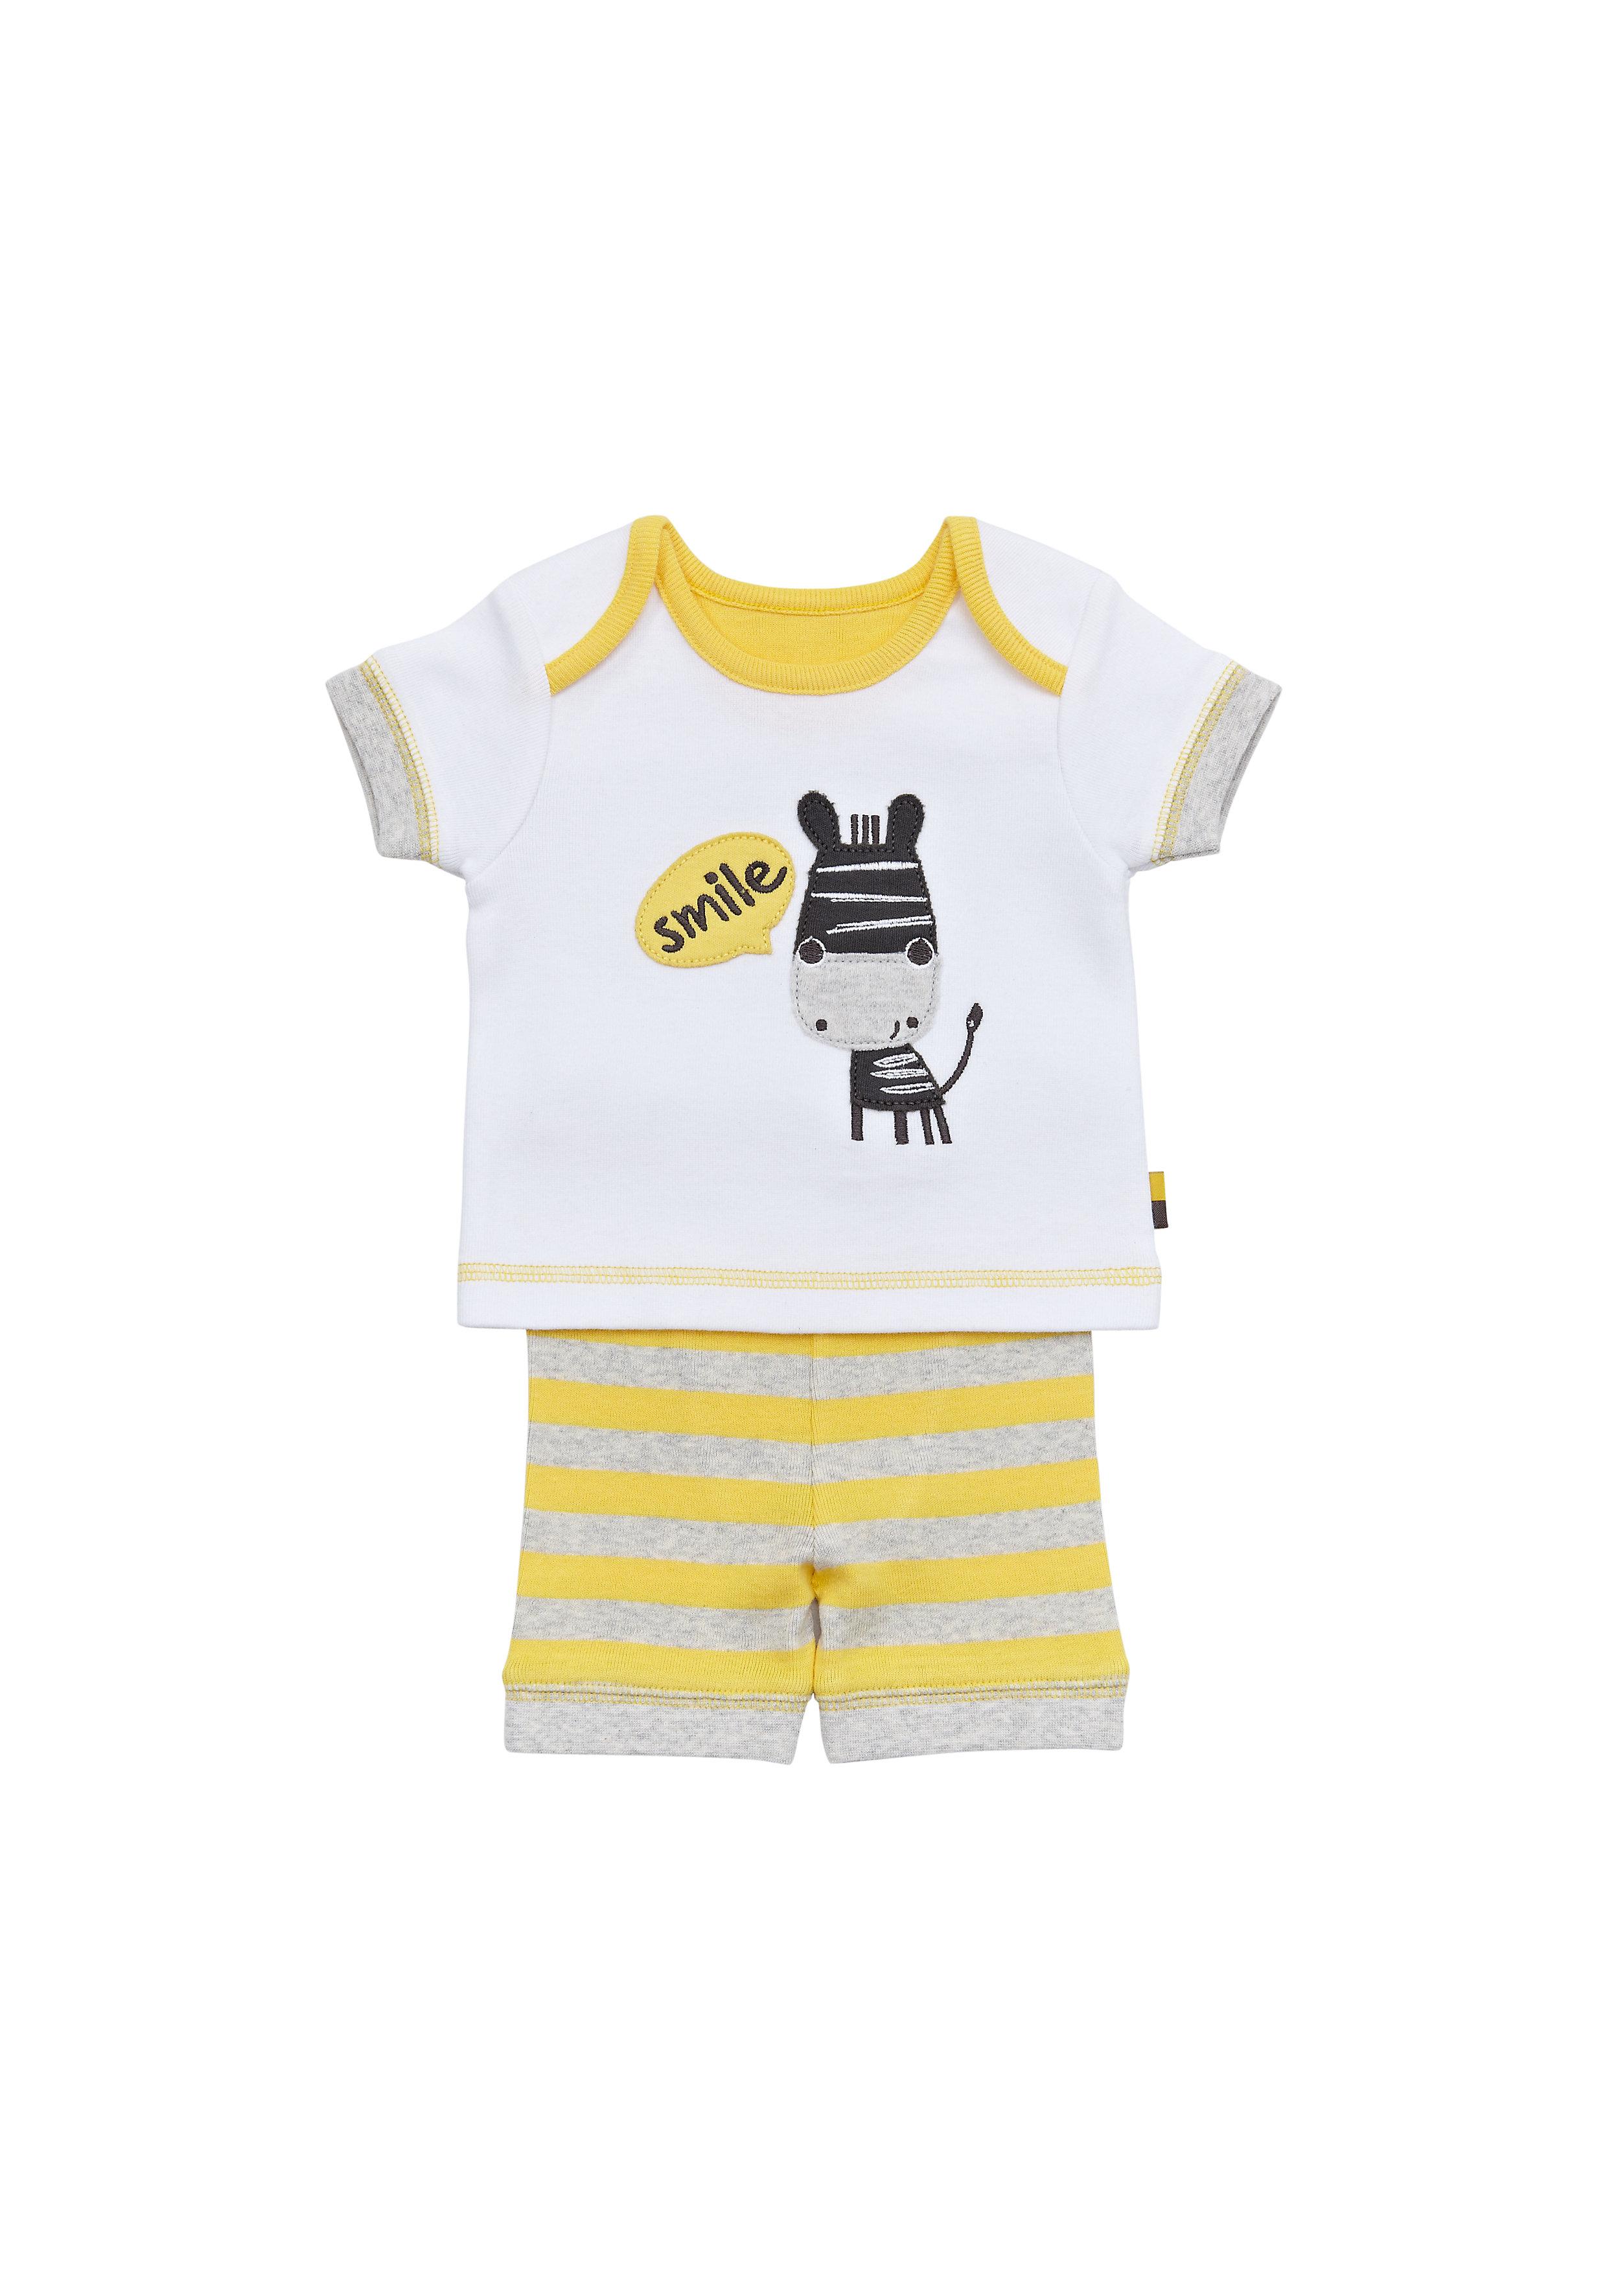 Mothercare | Unisex Half Sleeves Shortie Pyjama Set Zebra Patchwork - Yellow